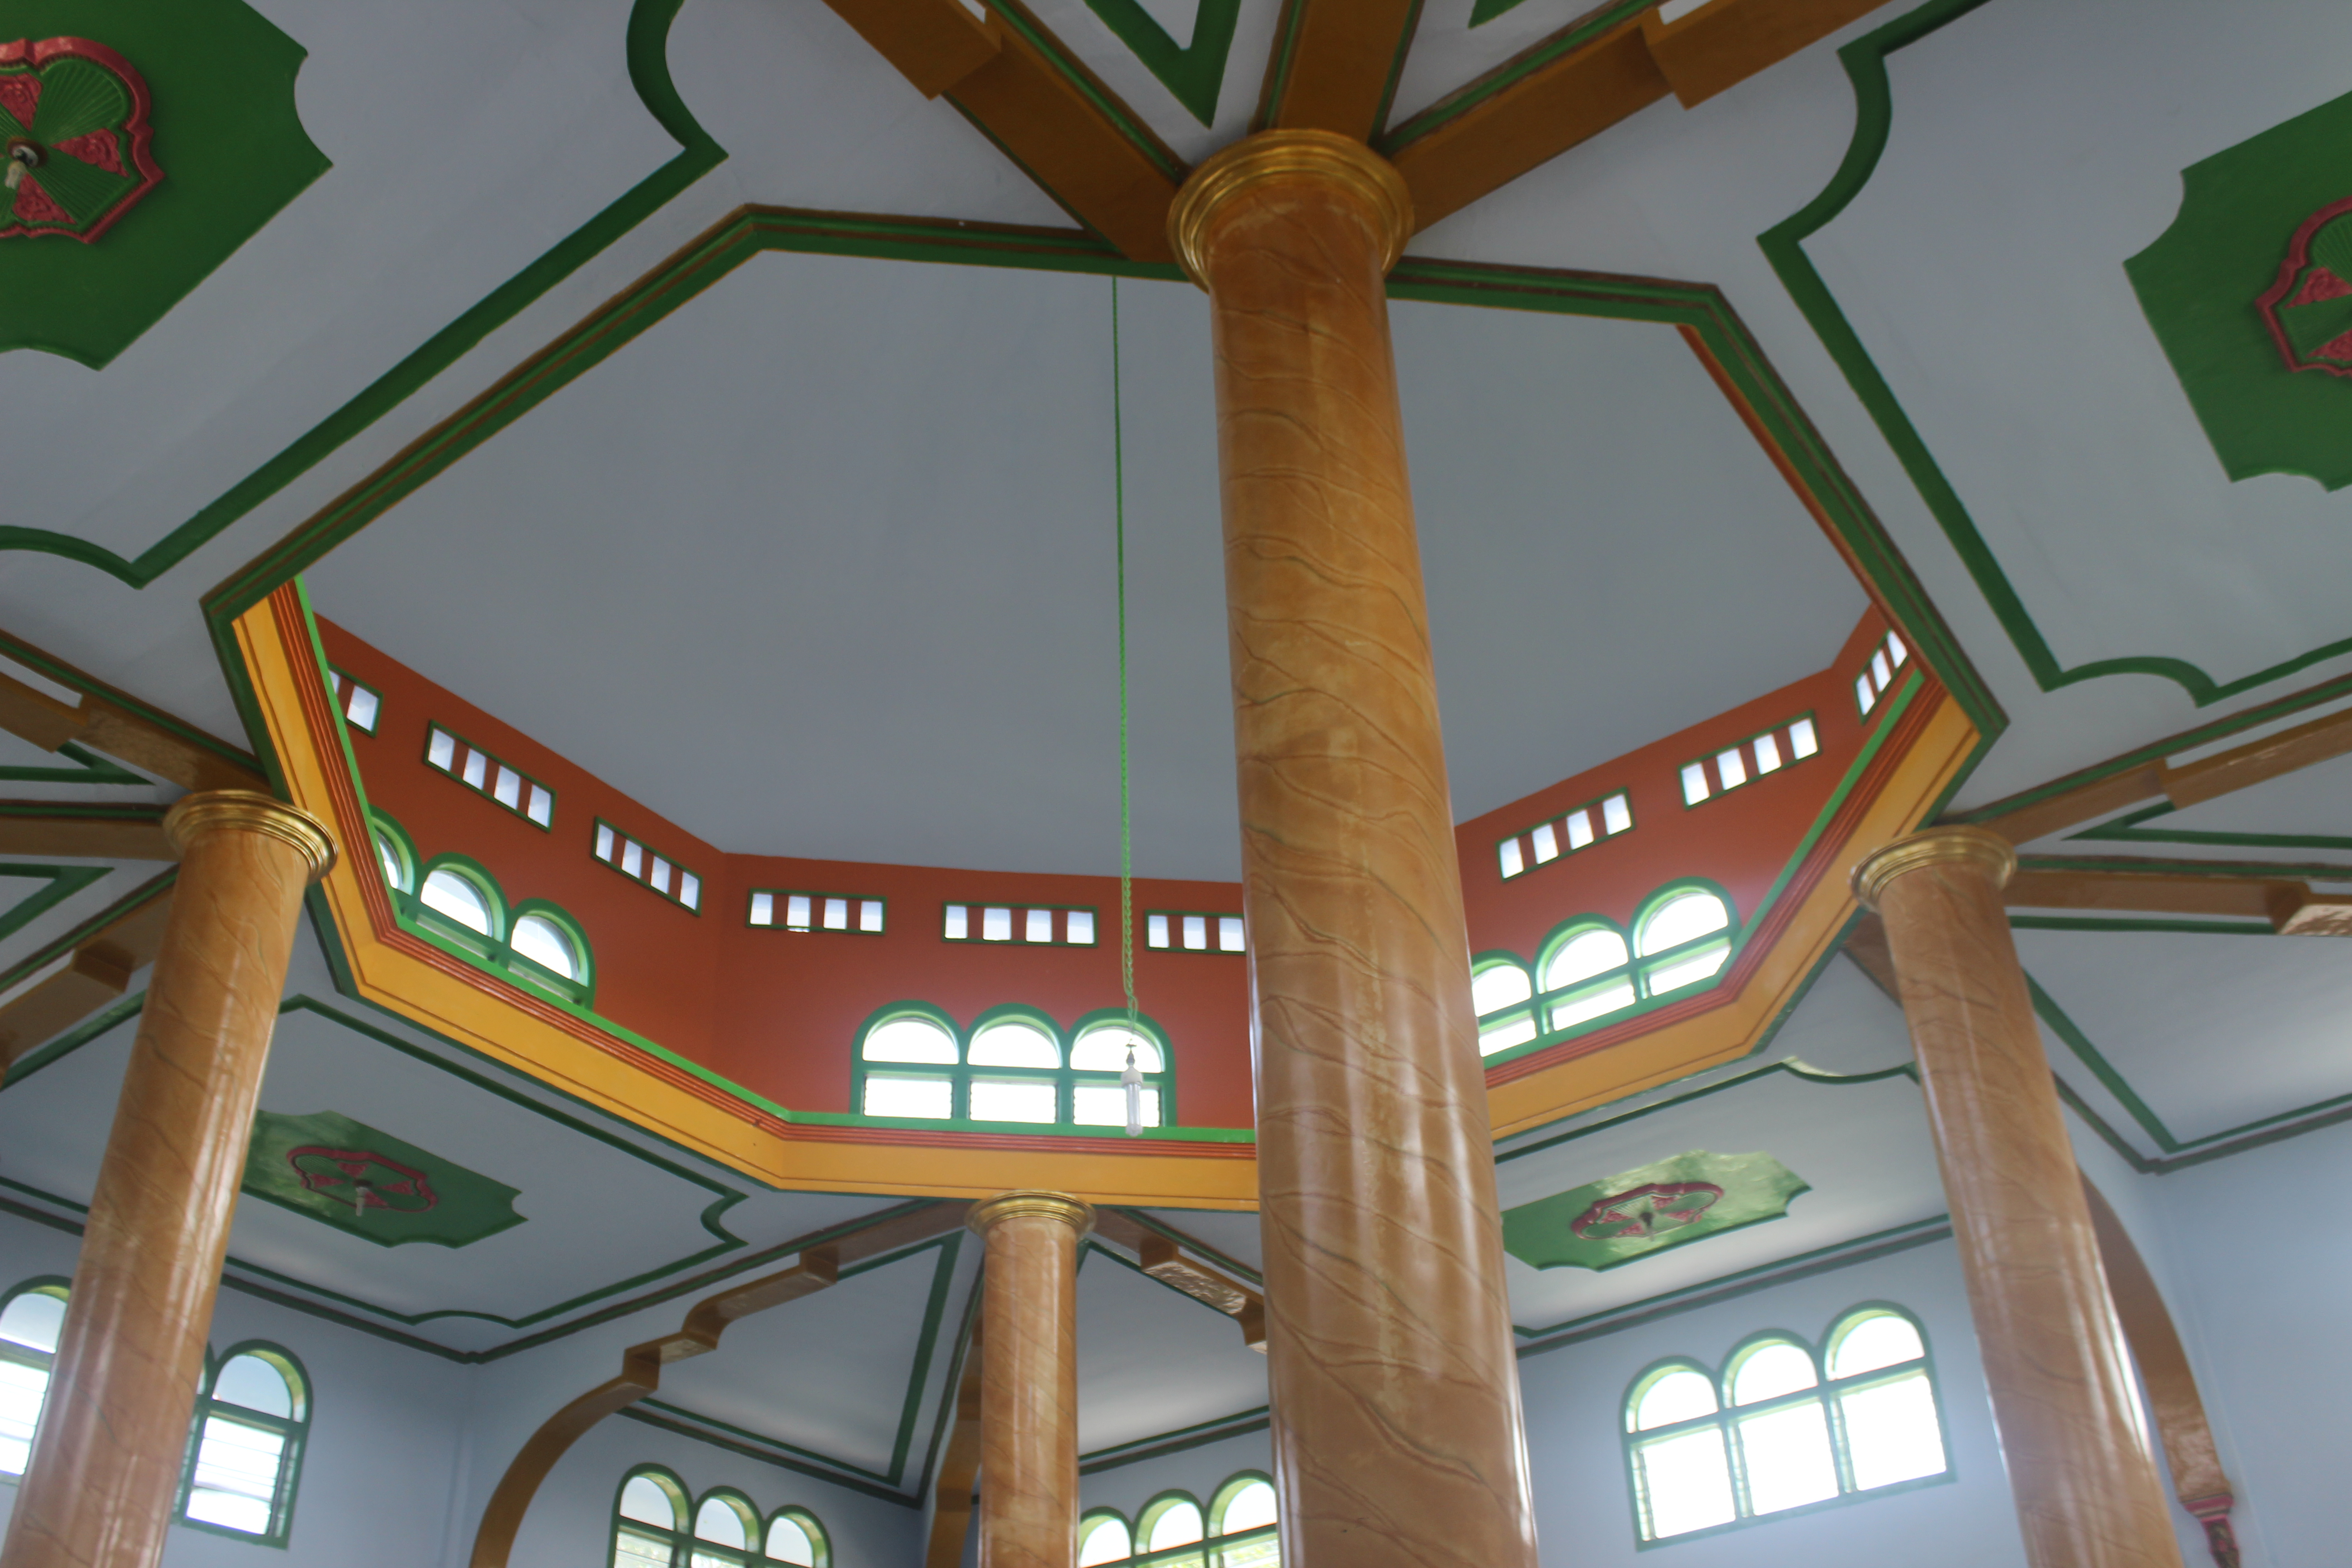 Salah satu masjid dengan arsitektur menarik yang berdiri di Probolinggo